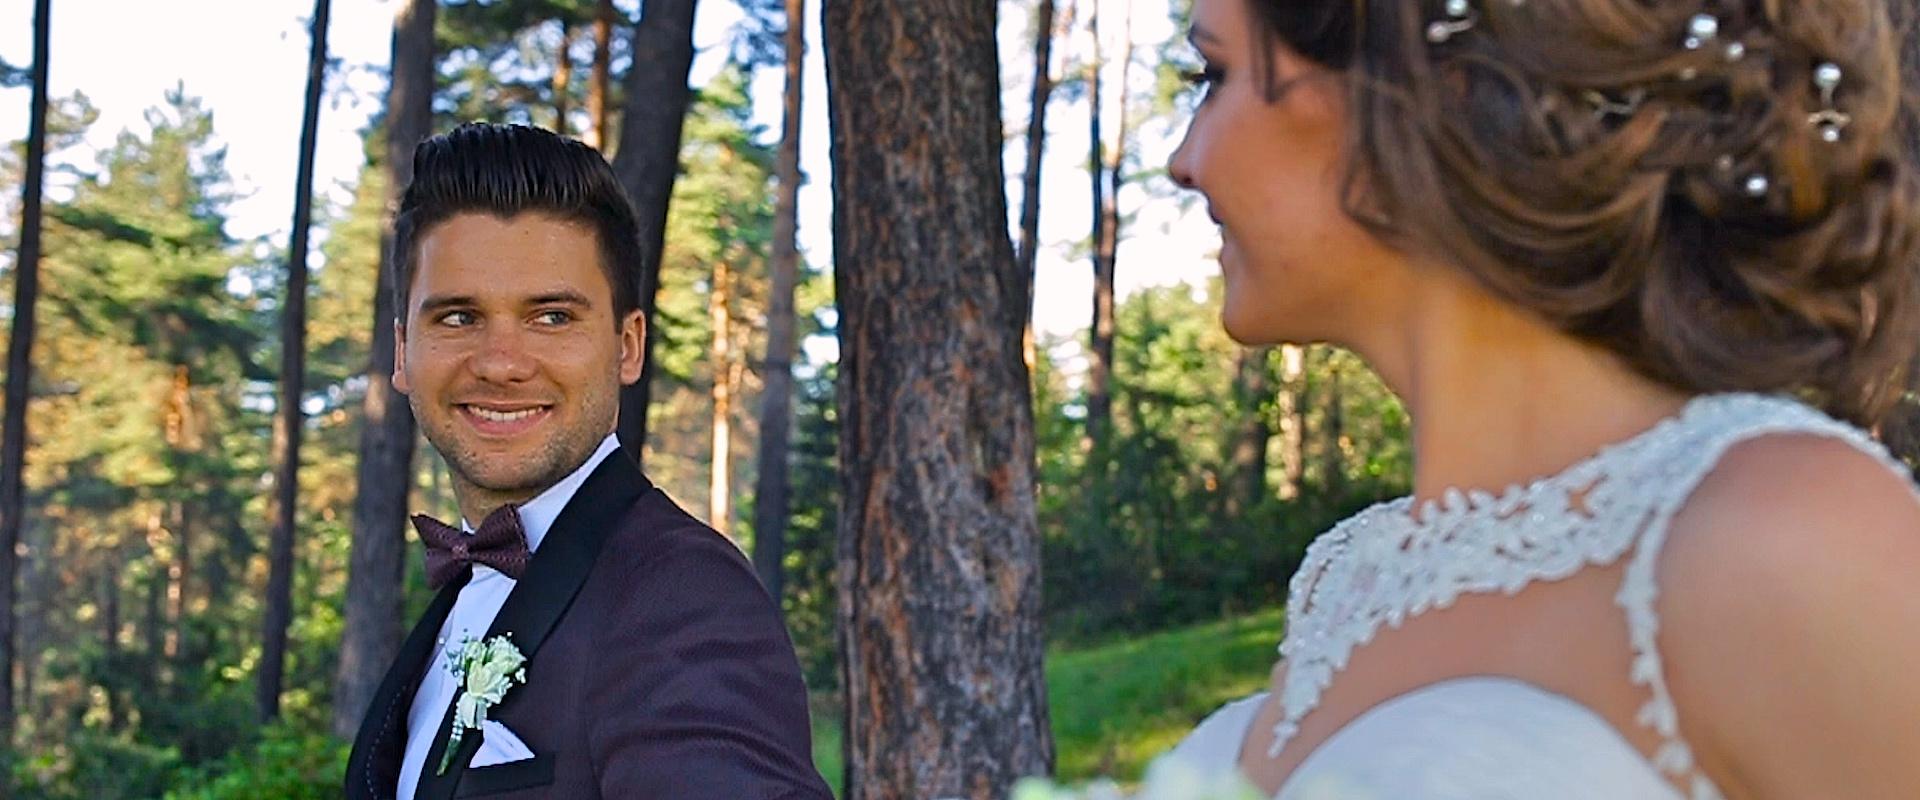 Mountain wedding - shooting with the couple